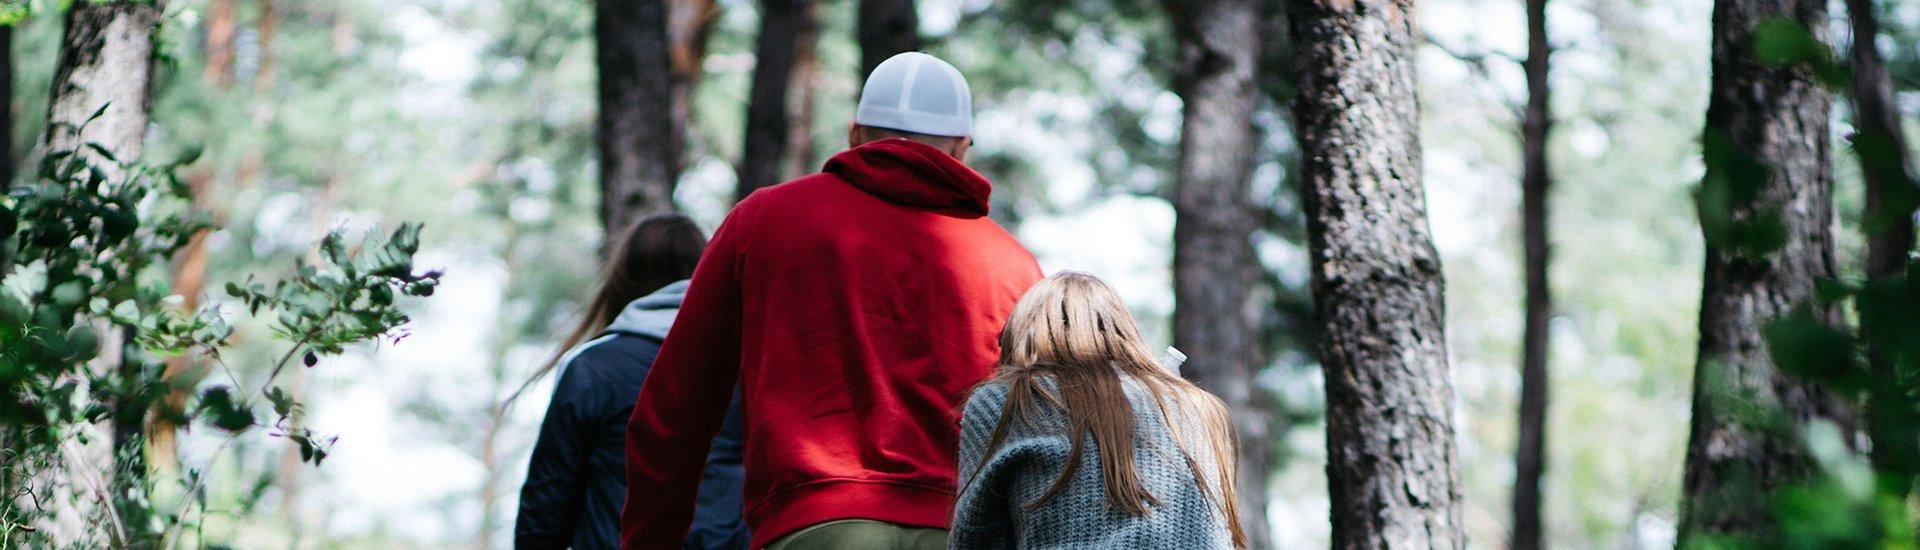 people-hiking-on-trail